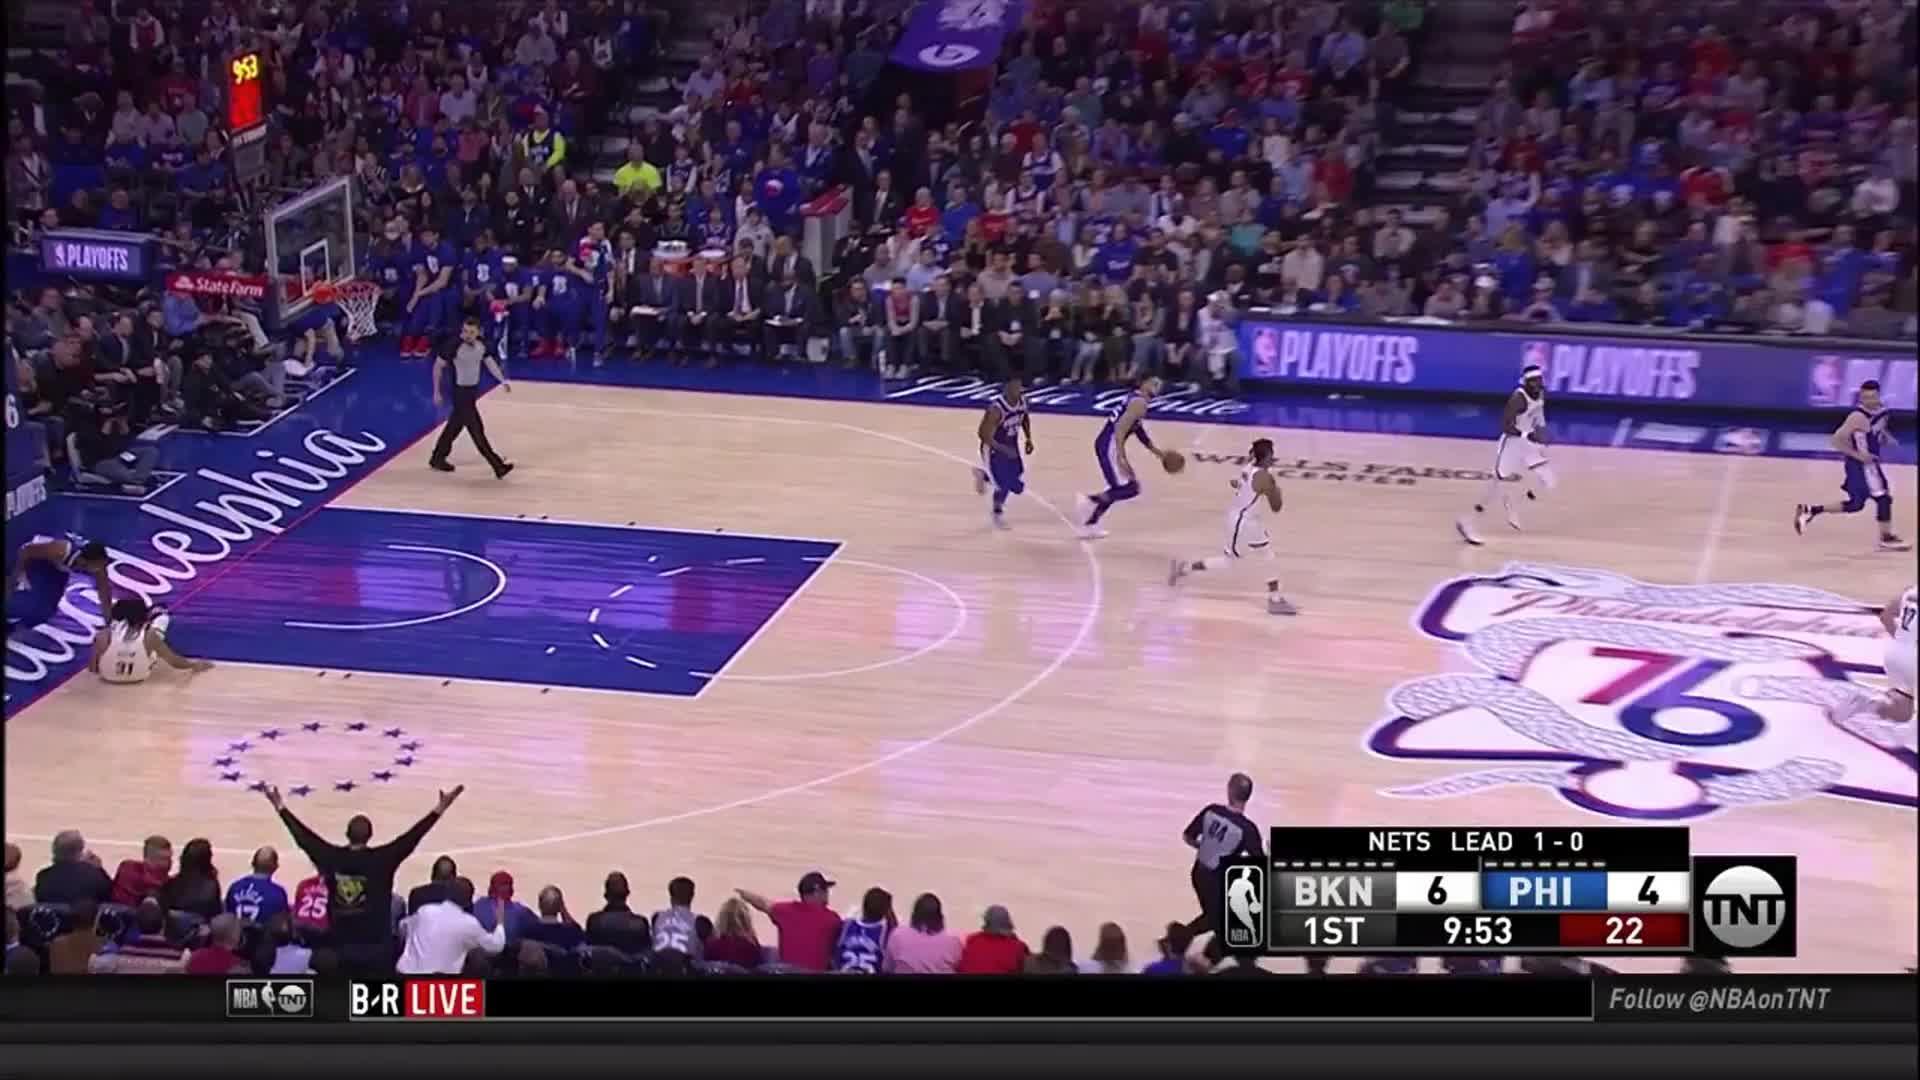 Ben Simmons, Brooklyn Nets, NBA, Philadelphia 76ers, basketball, Ben Simmons transition attack Brooklyn Game Two GIFs